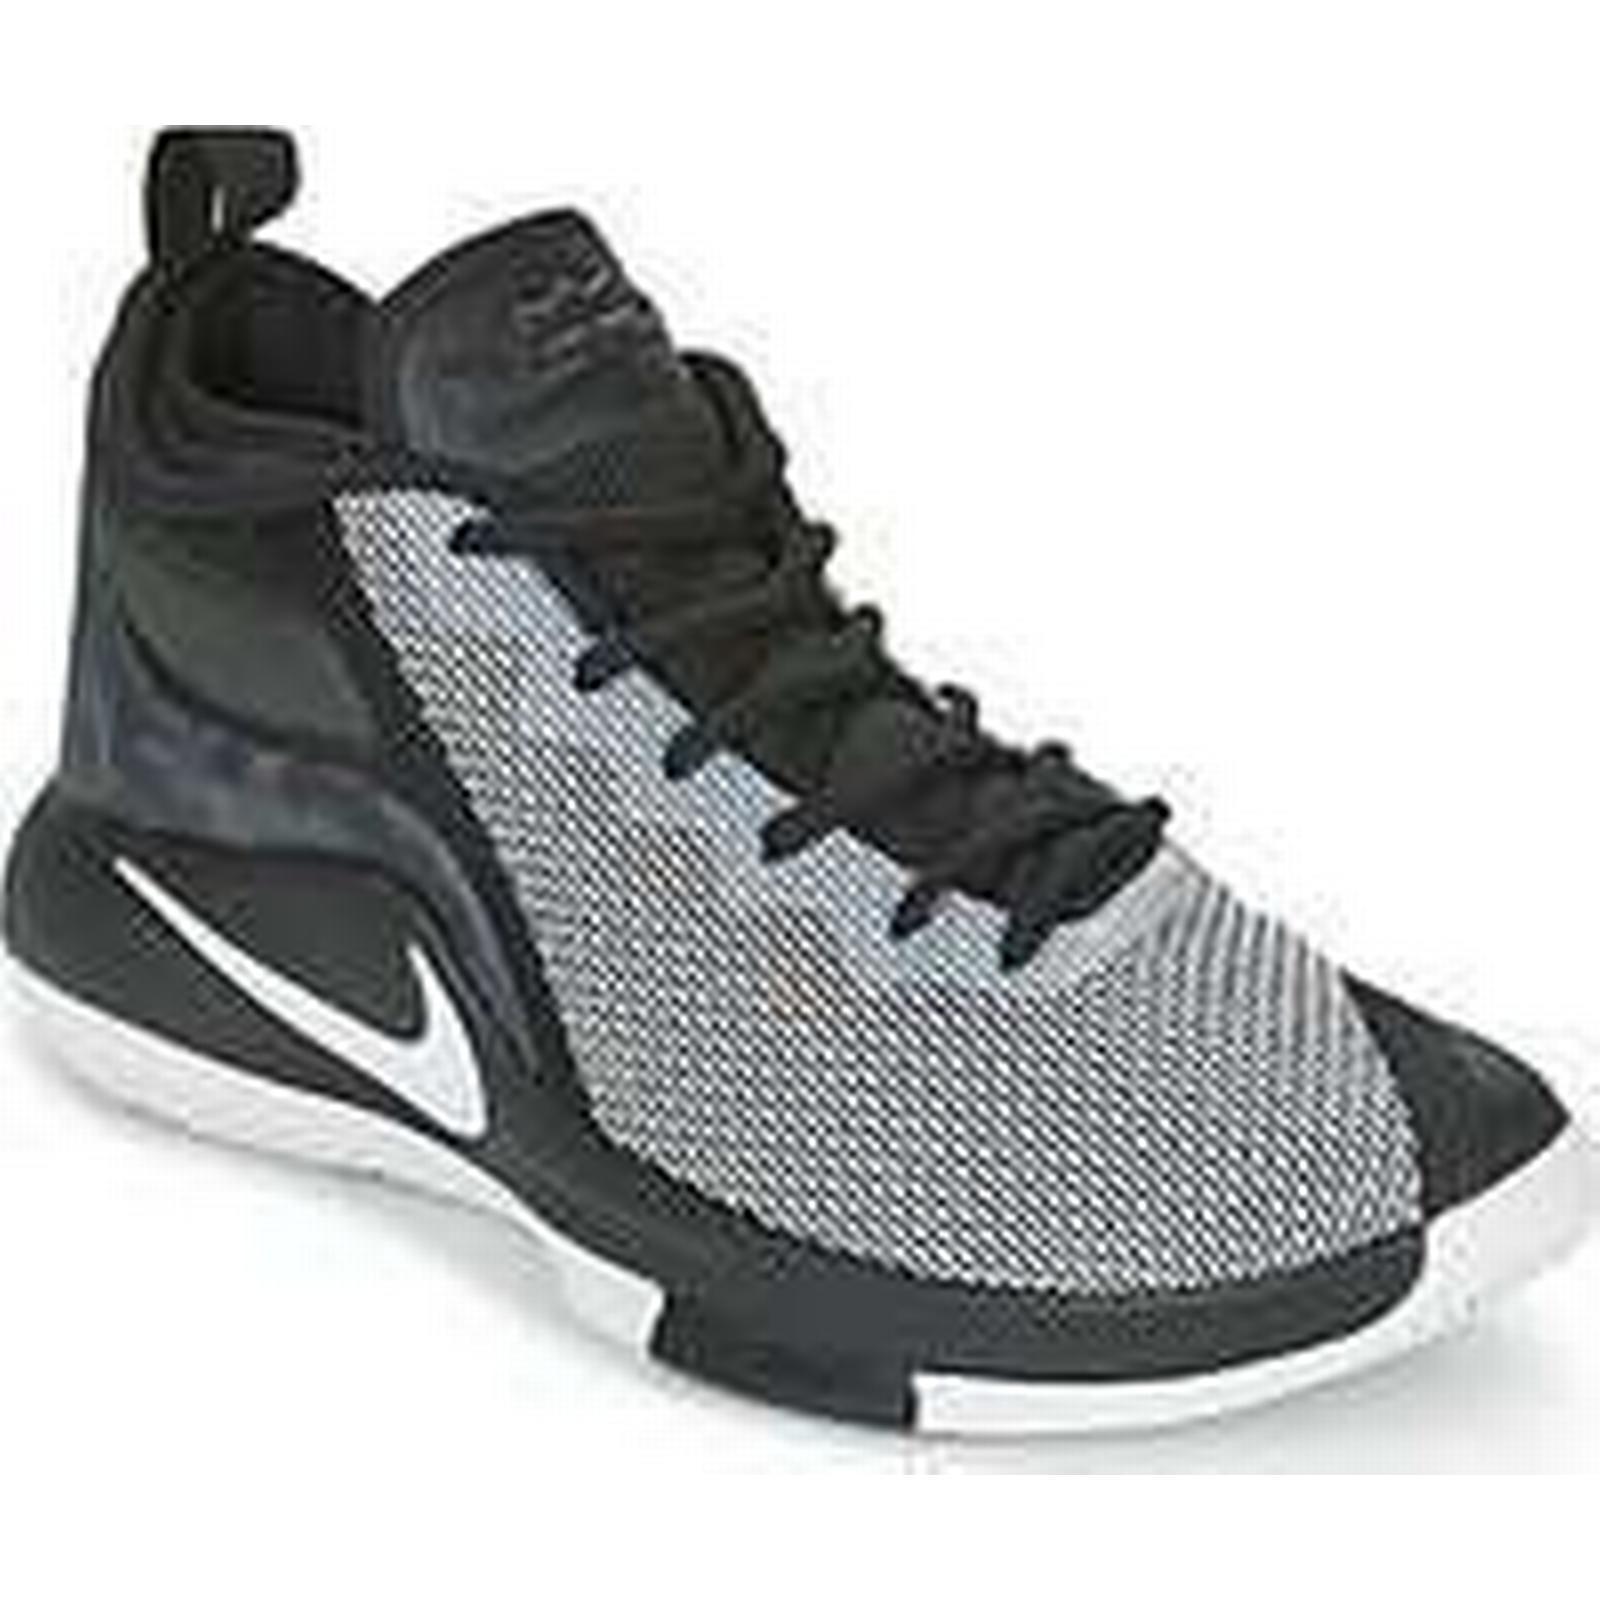 65488127fea8a ... canada spartoo nike lebron witness ii black mens basketball trainers  shoes 4ccab ef528